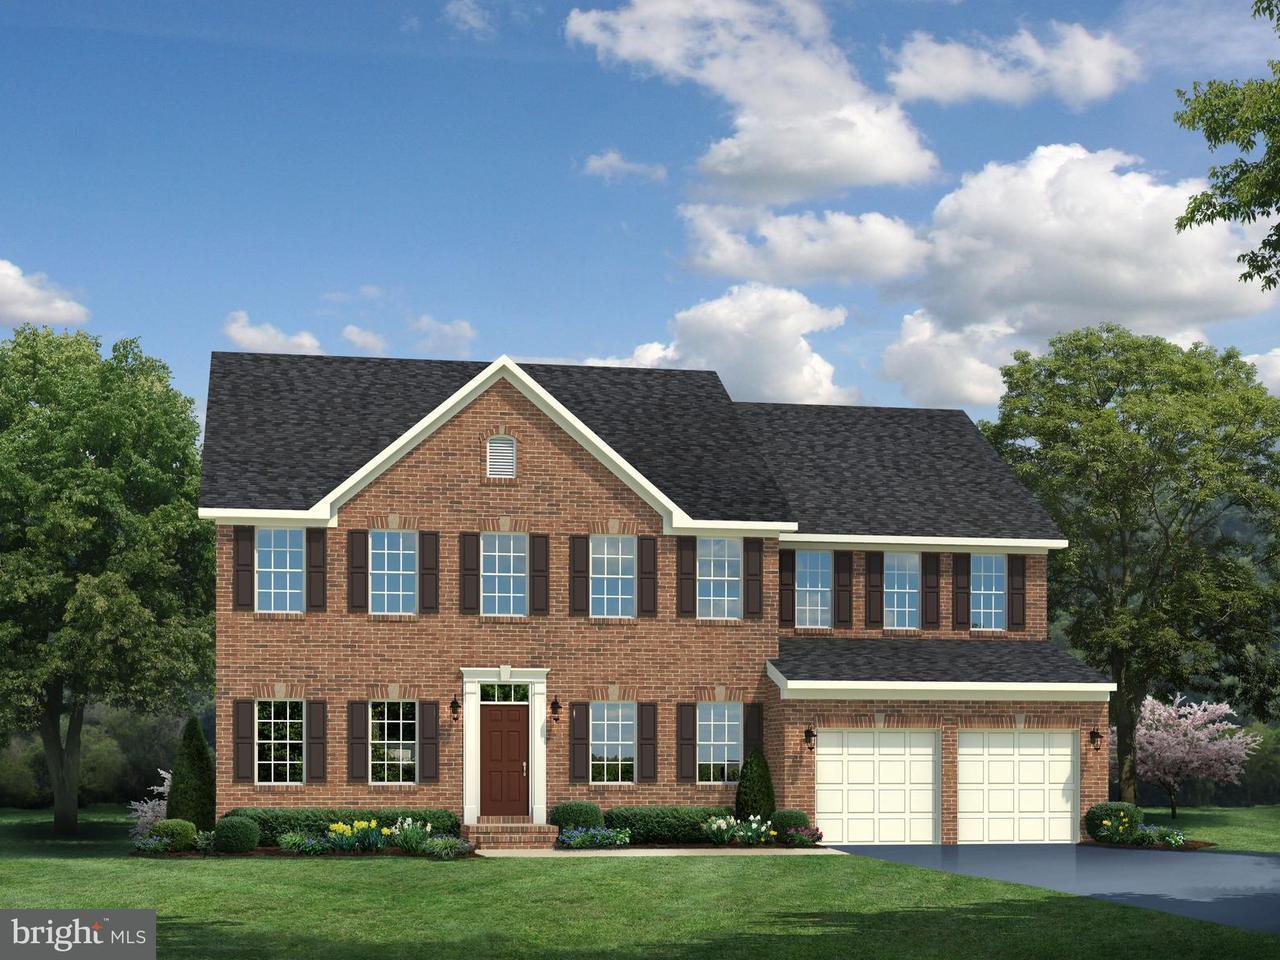 14401 owings ave brandywine md mls 1004321881 better homes and gardens real estate. Black Bedroom Furniture Sets. Home Design Ideas